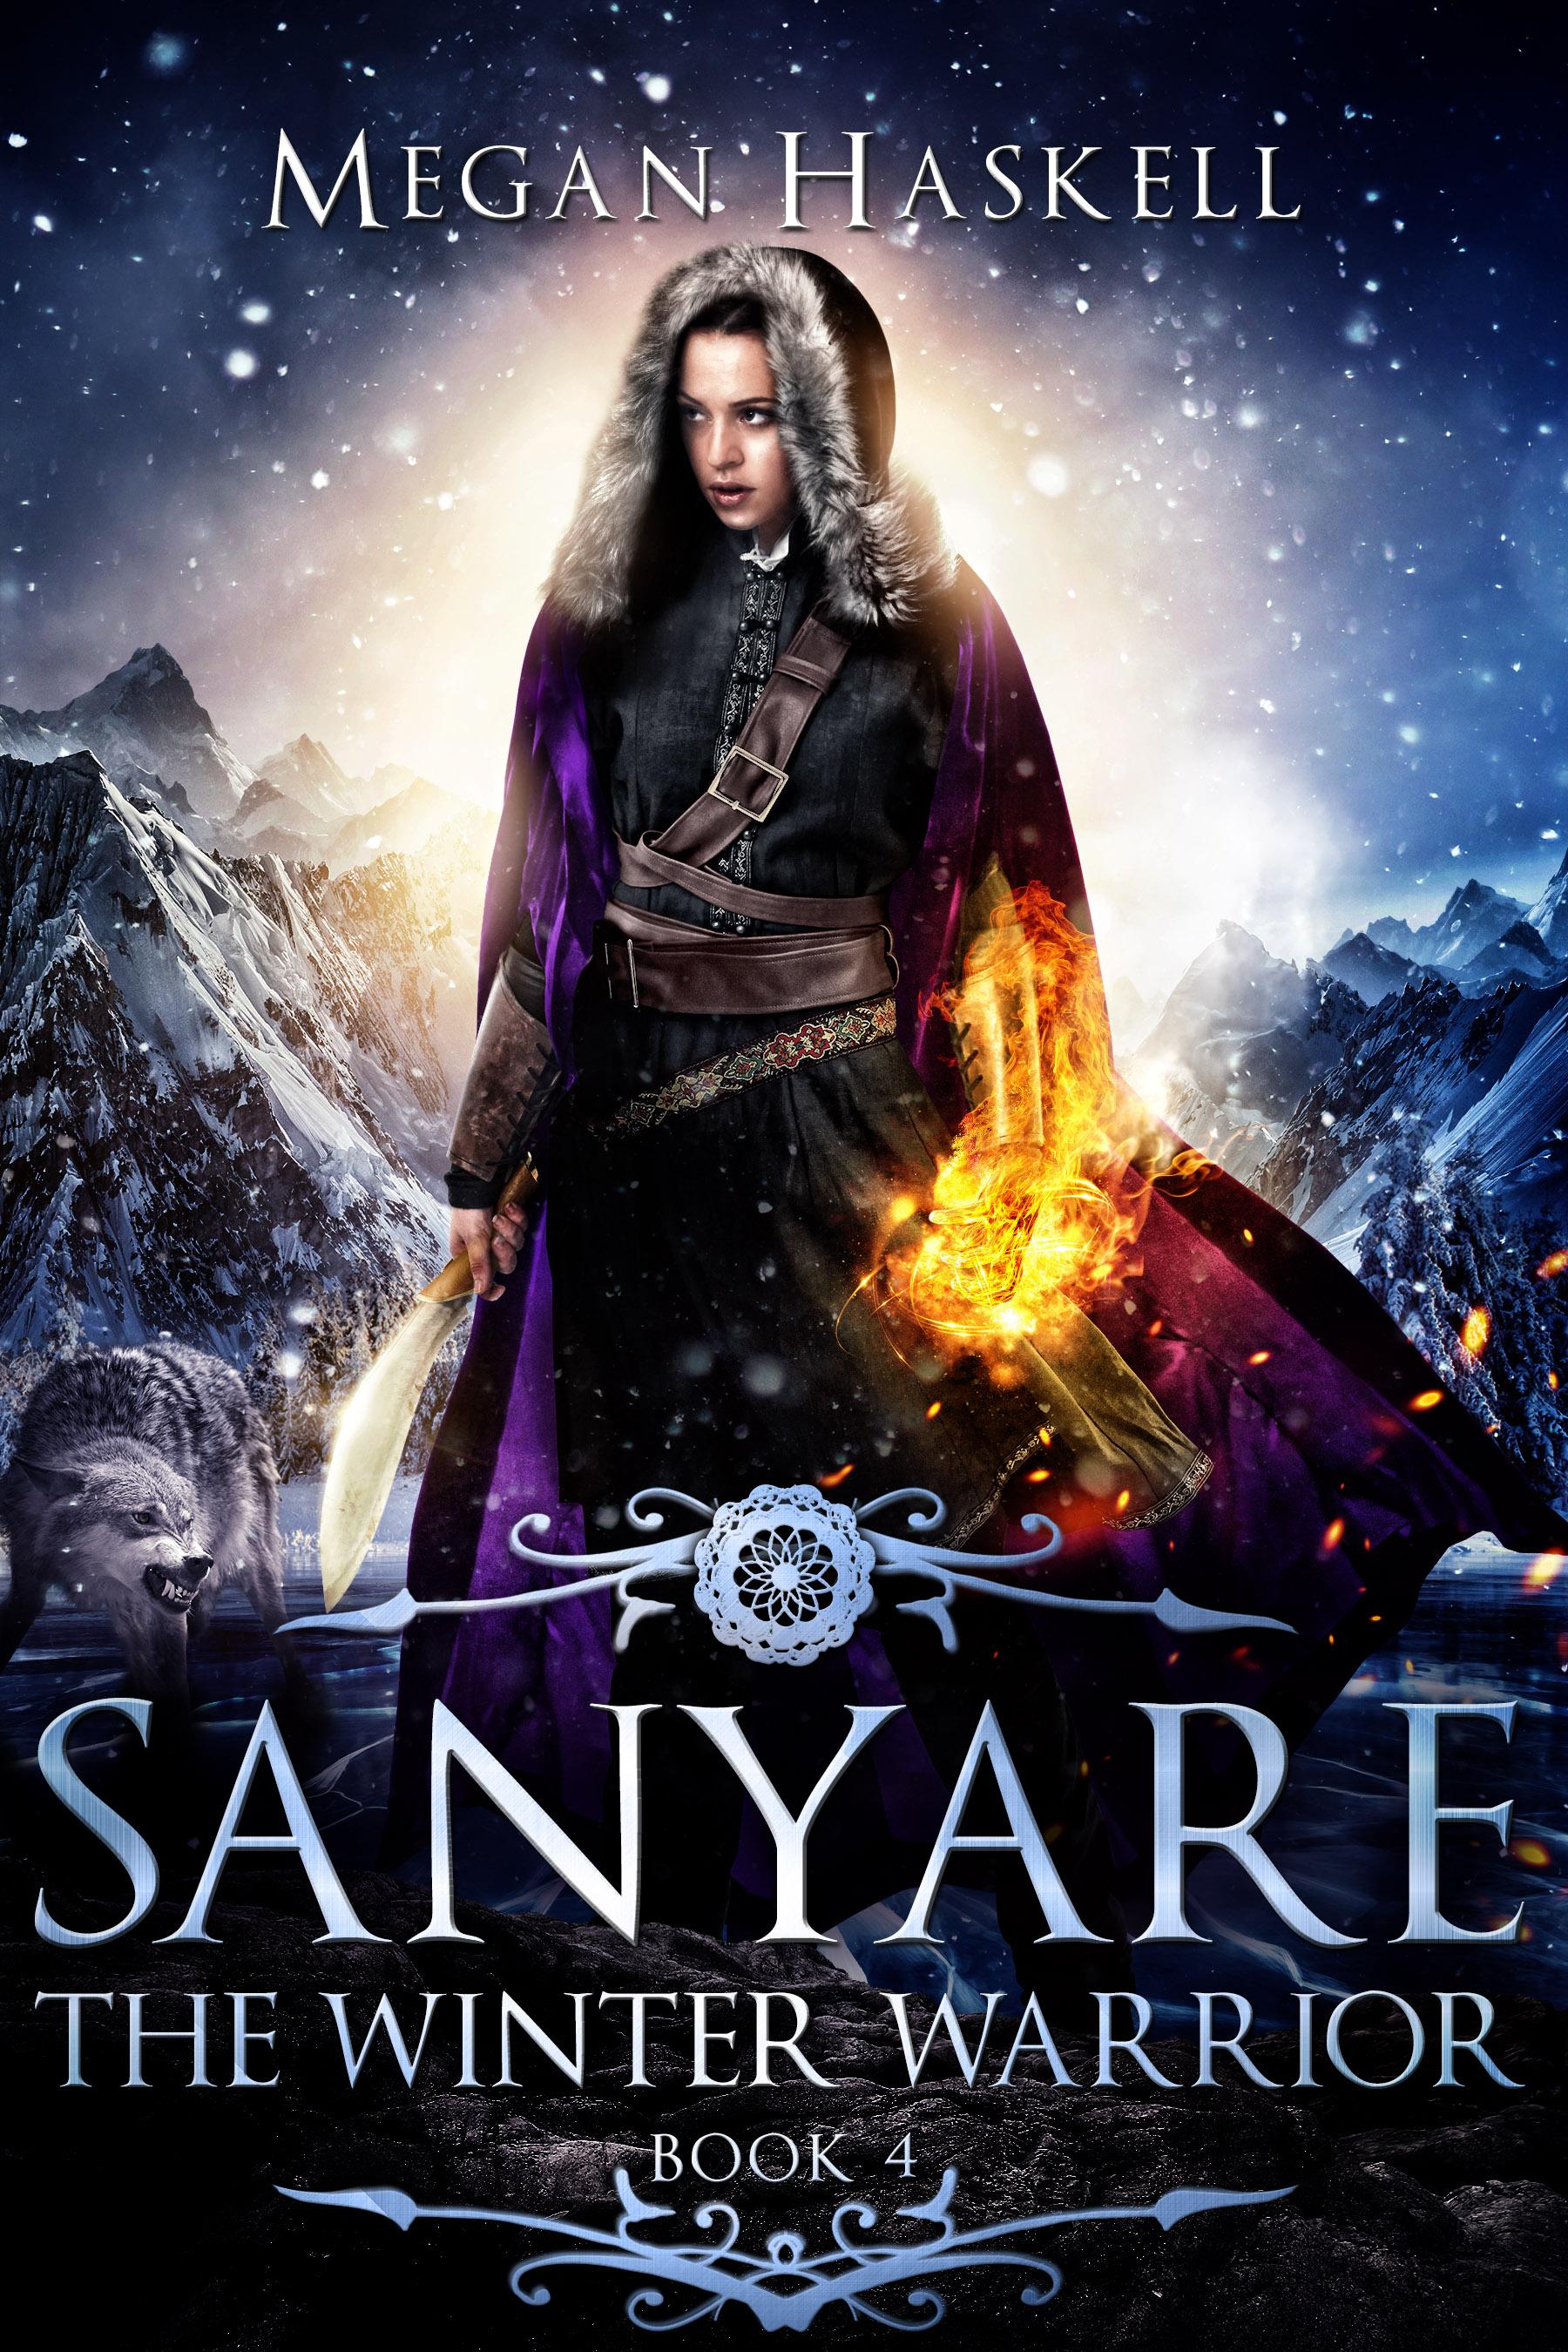 Sanyare The Winter Warrior